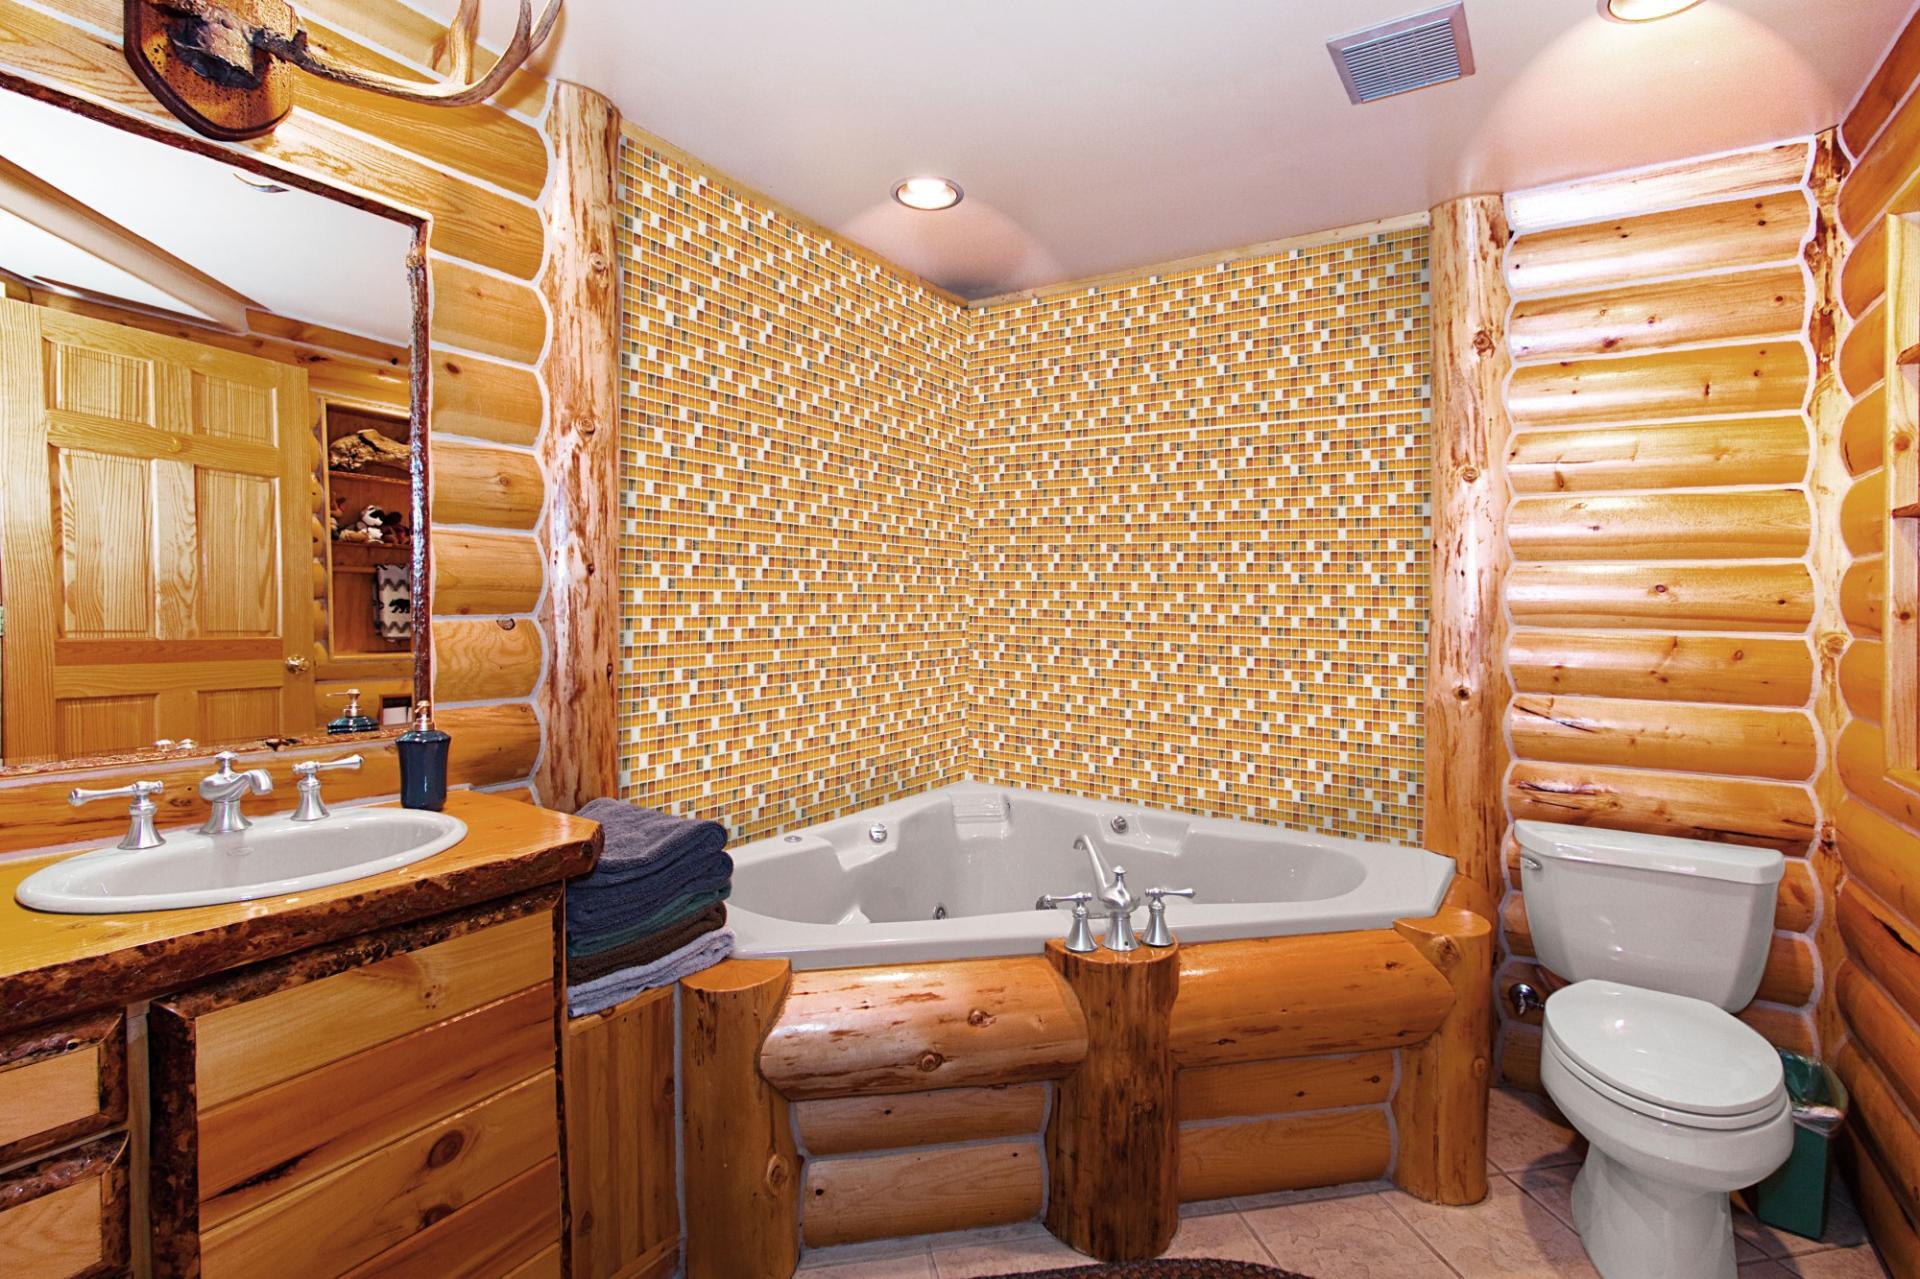 Mosaic amber